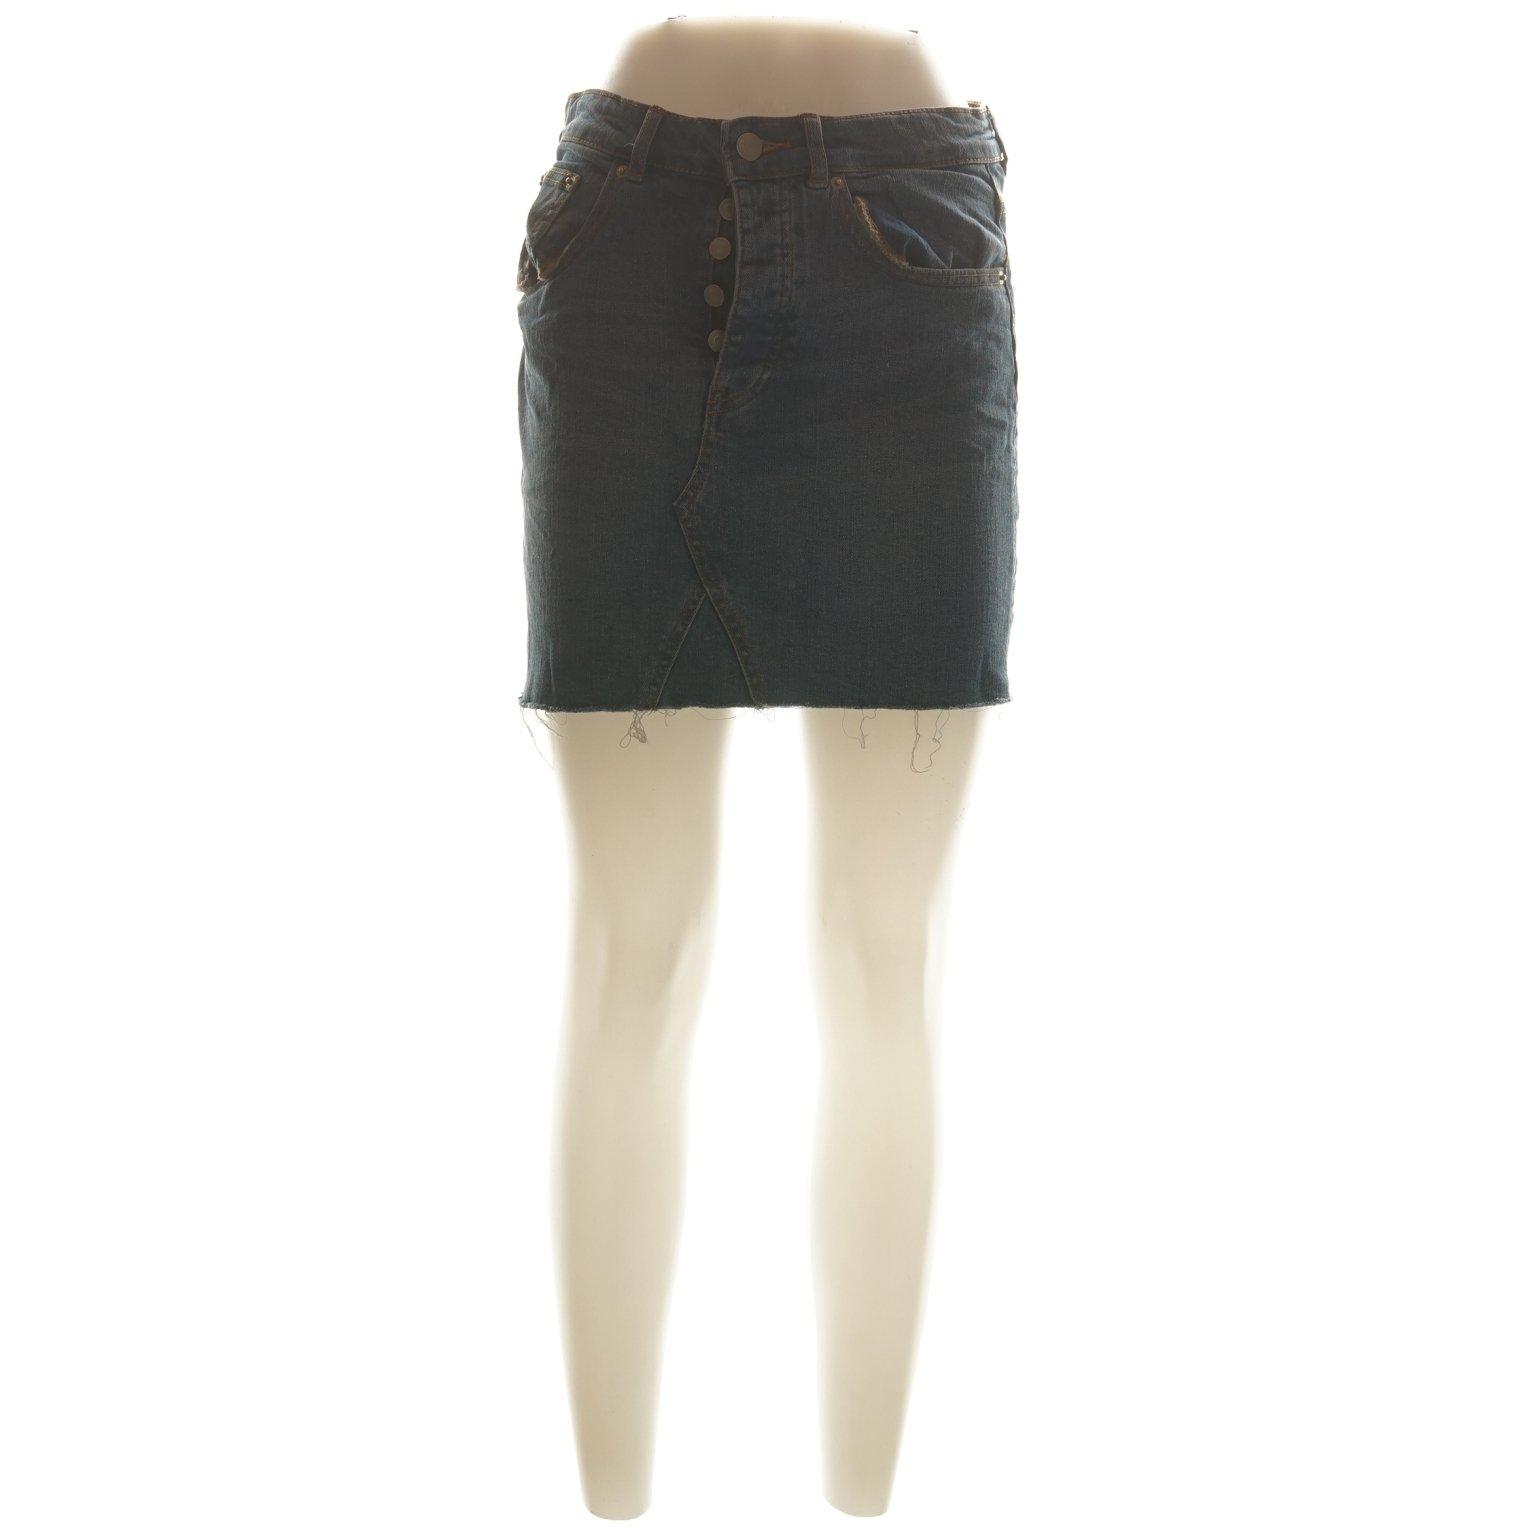 c70b9704c326 Perfect Jeans Gina Tricot, Kjol, Strl: 36, Blå (346064363) ᐈ Sellpy ...